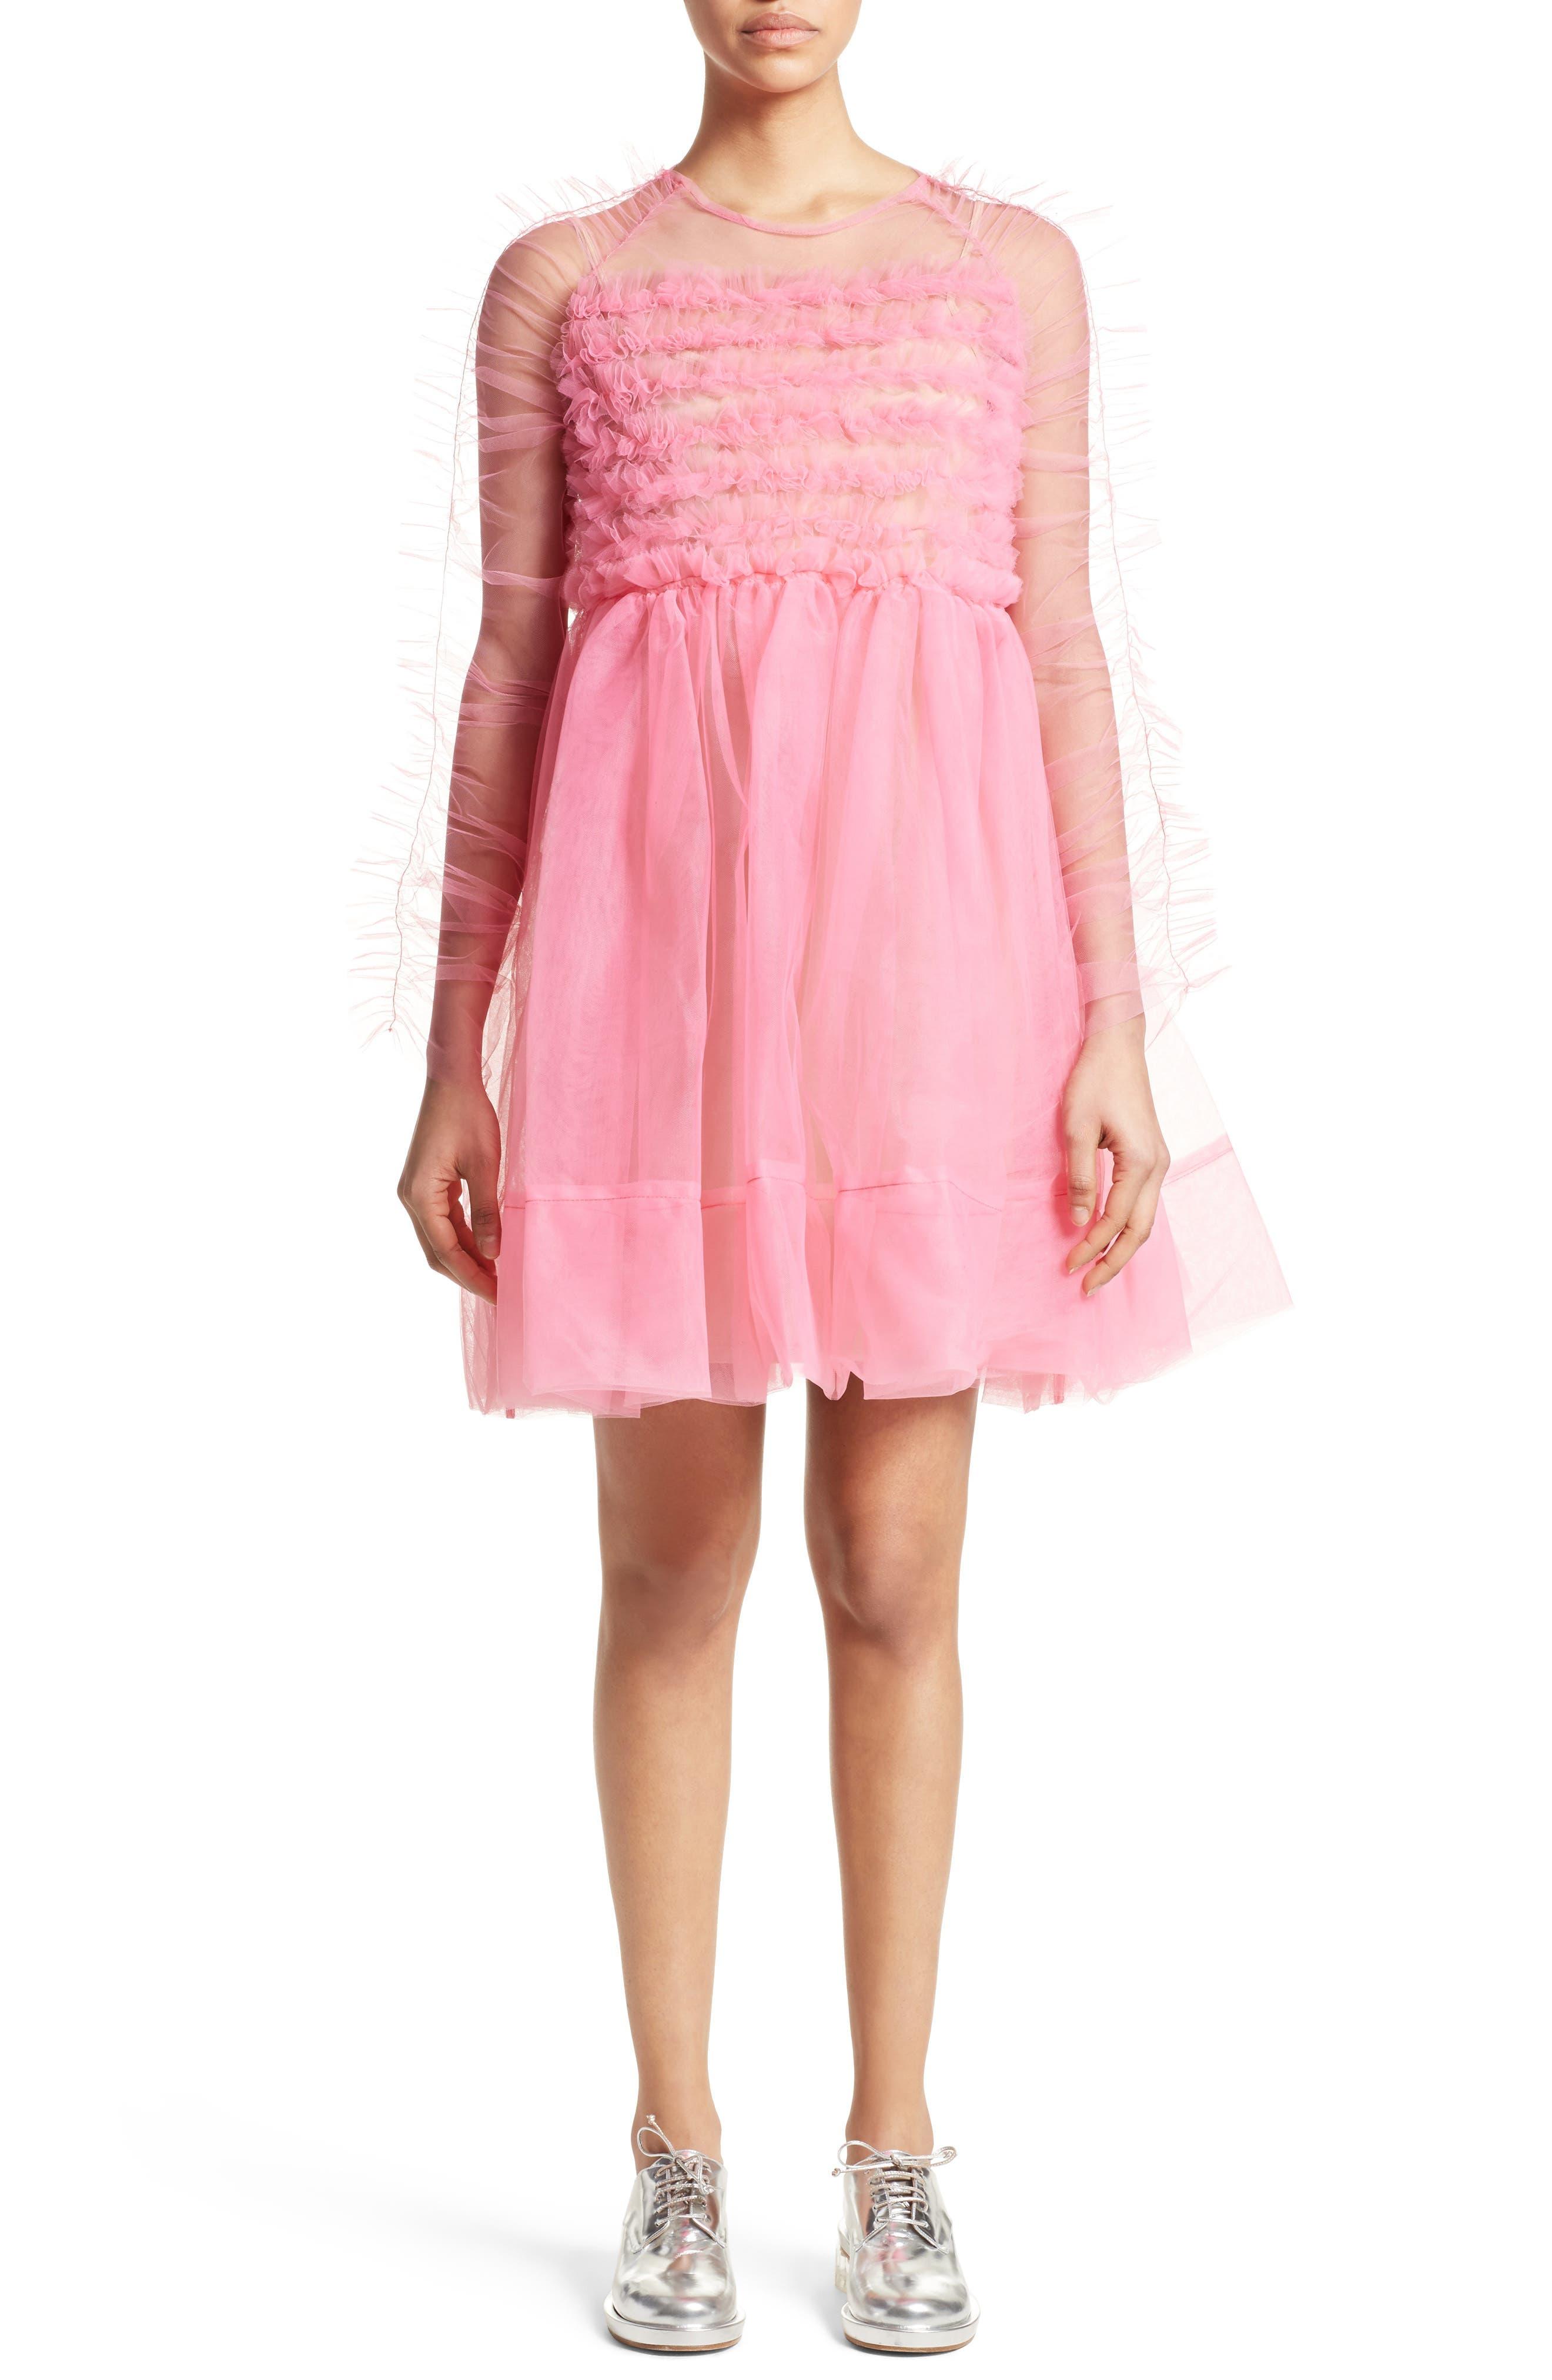 Alternate Image 1 Selected - Molly Goddard Funky Tulle Dress